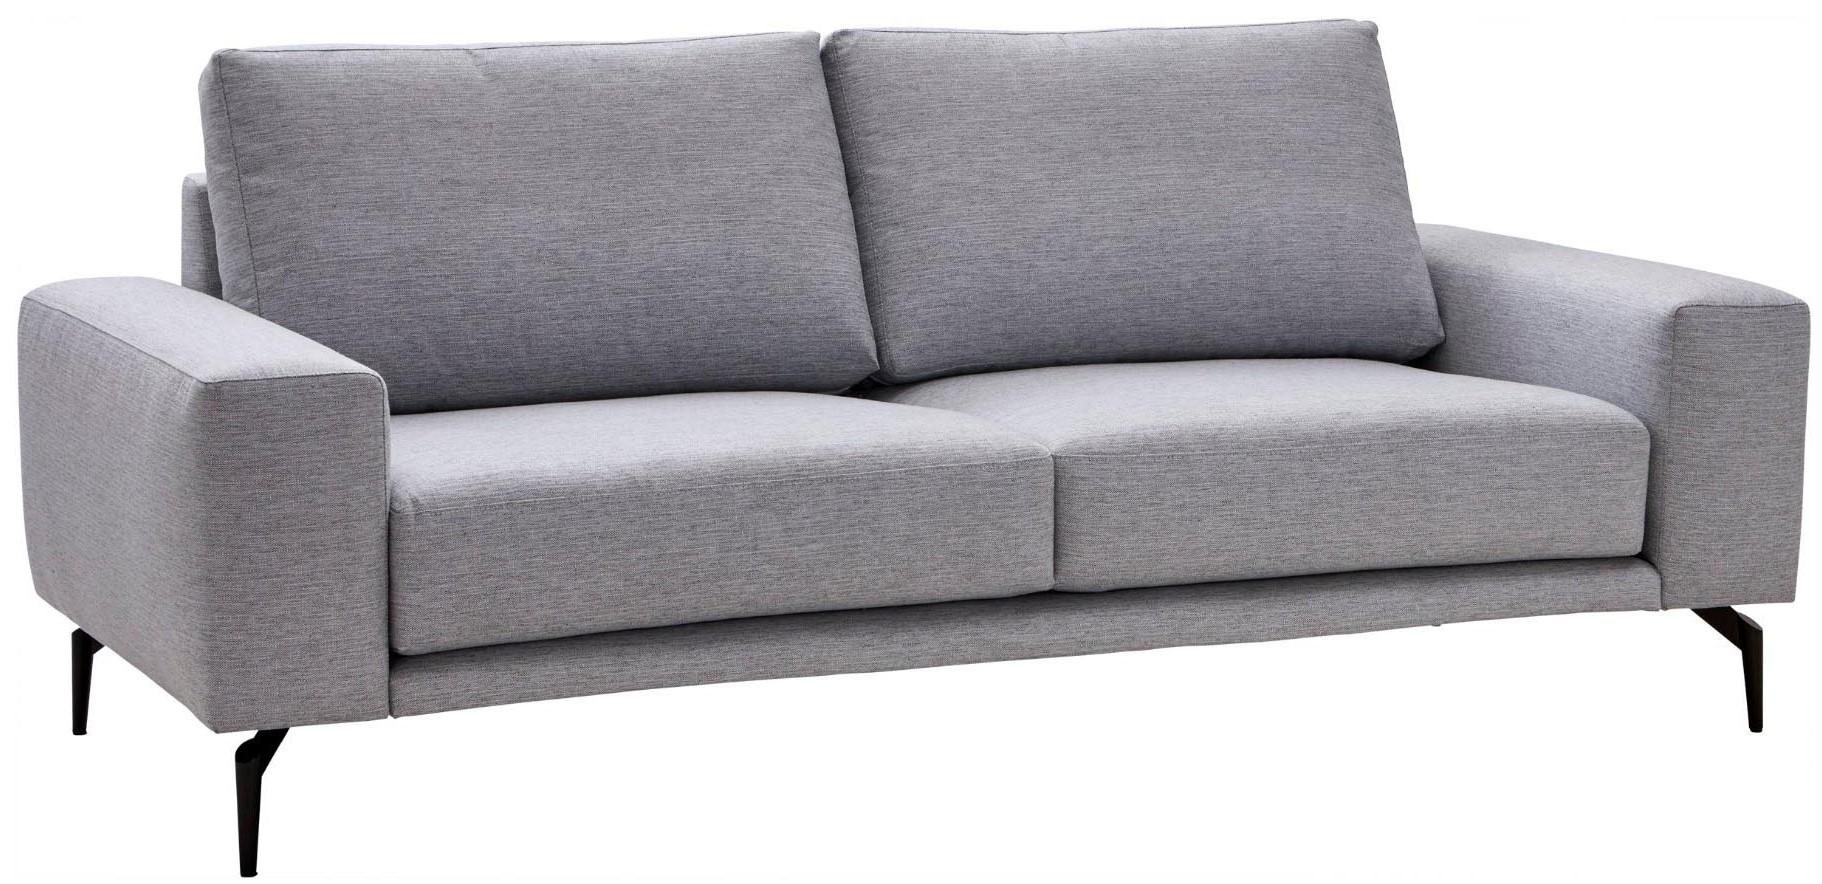 2,5-Sitzer-Sofa Natura Redington in hellgrauem Stoff